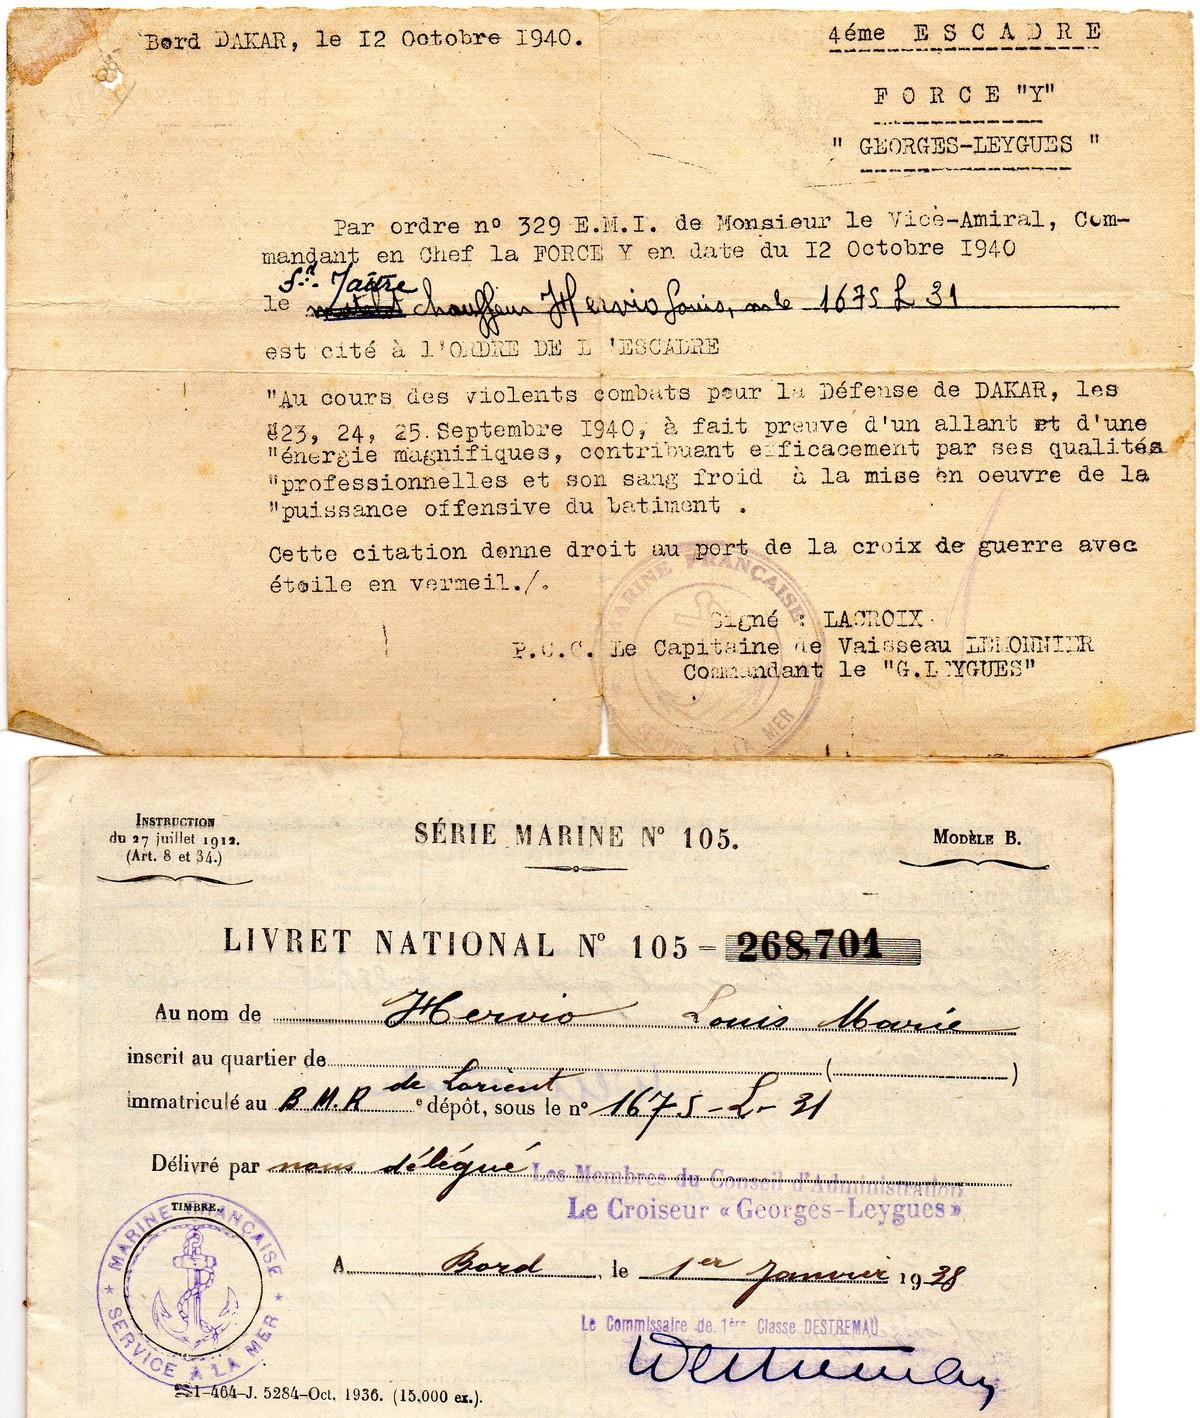 GEORGES LEYGUES (Croiseur) - Page 4 Img00210